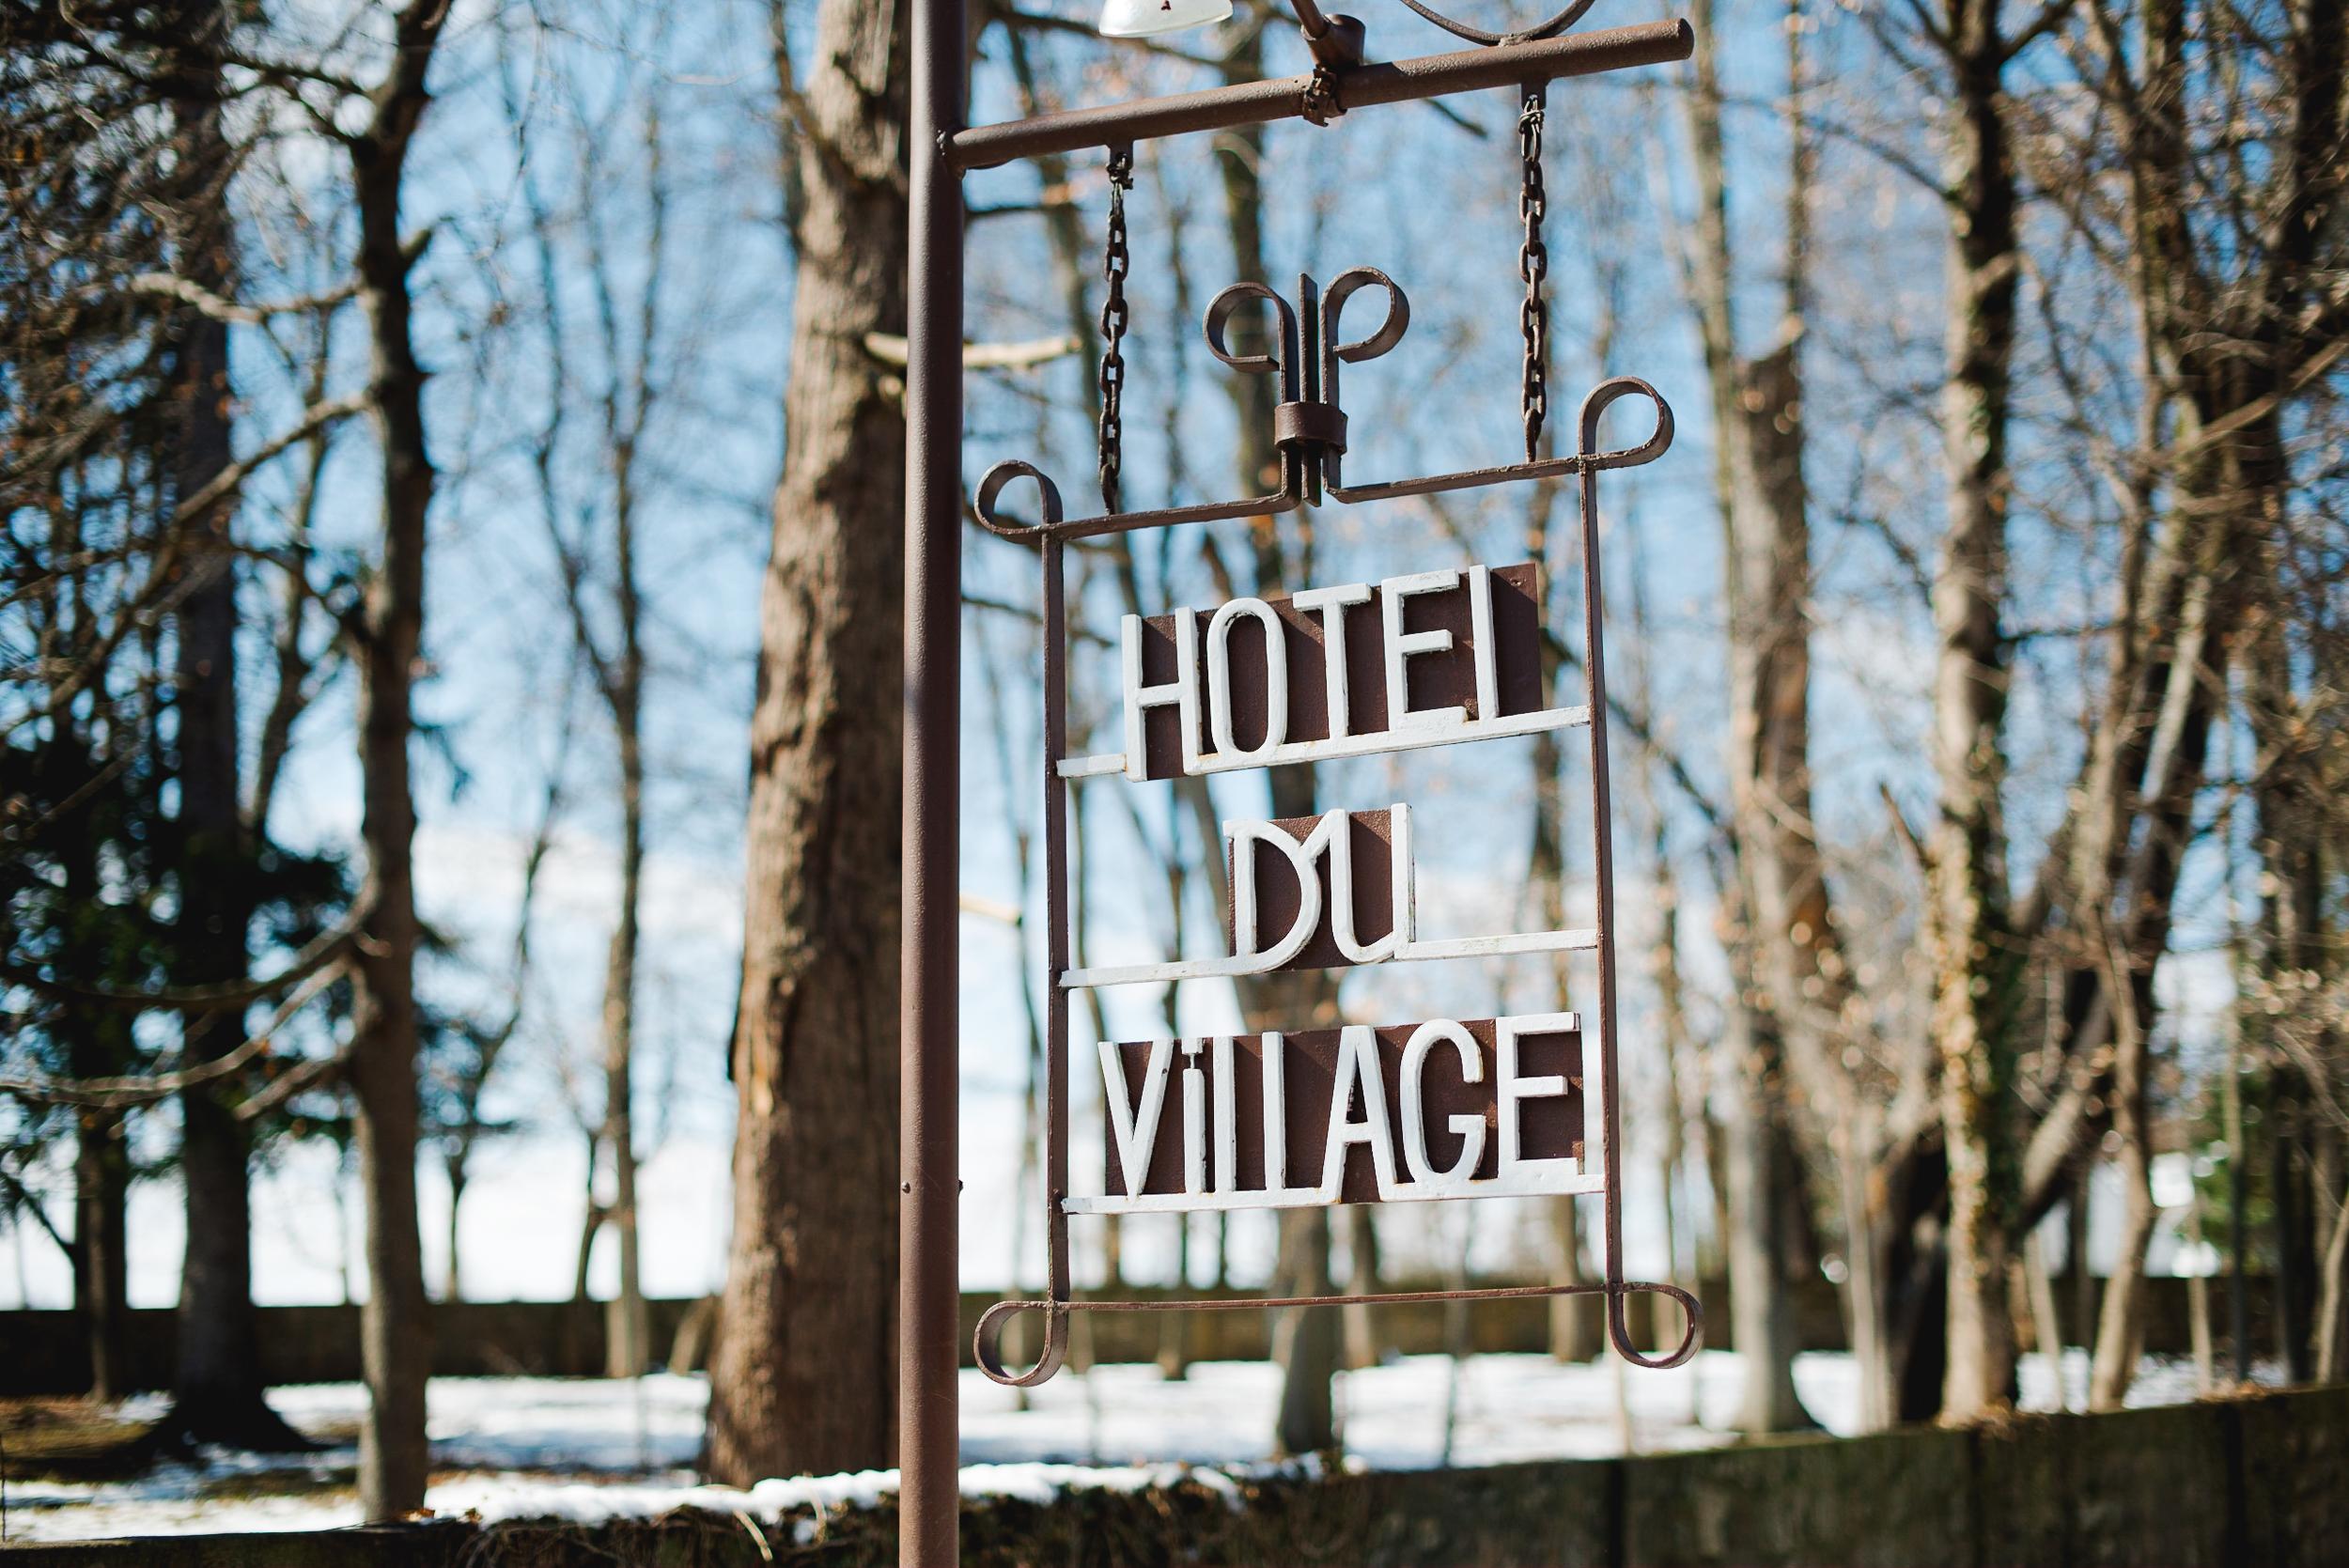 Hotel-du-village-wedding-winter-february-peaberry-photography-philadelphia-photographer-001.jpg